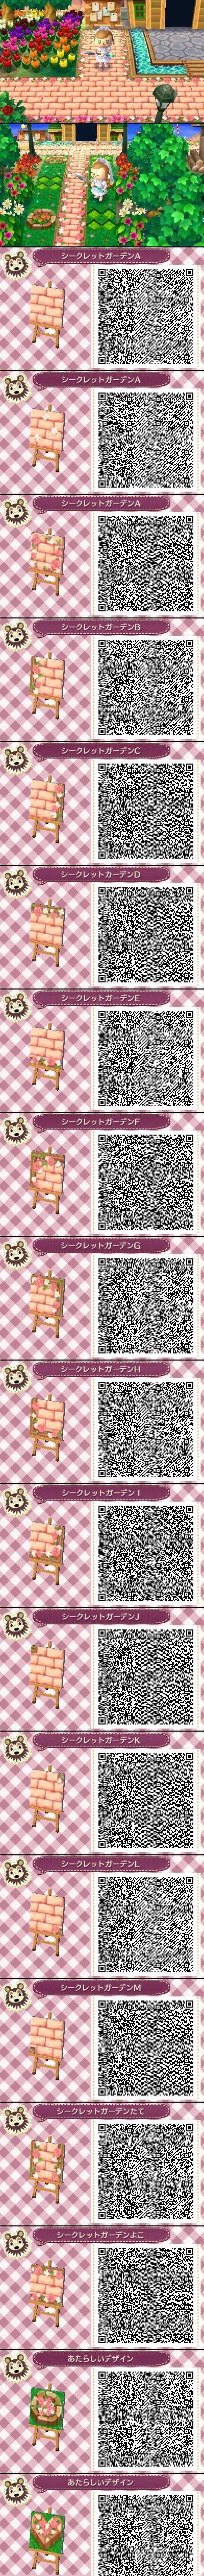 Animal Crossing: New Leaf - pink stone path QR-code: